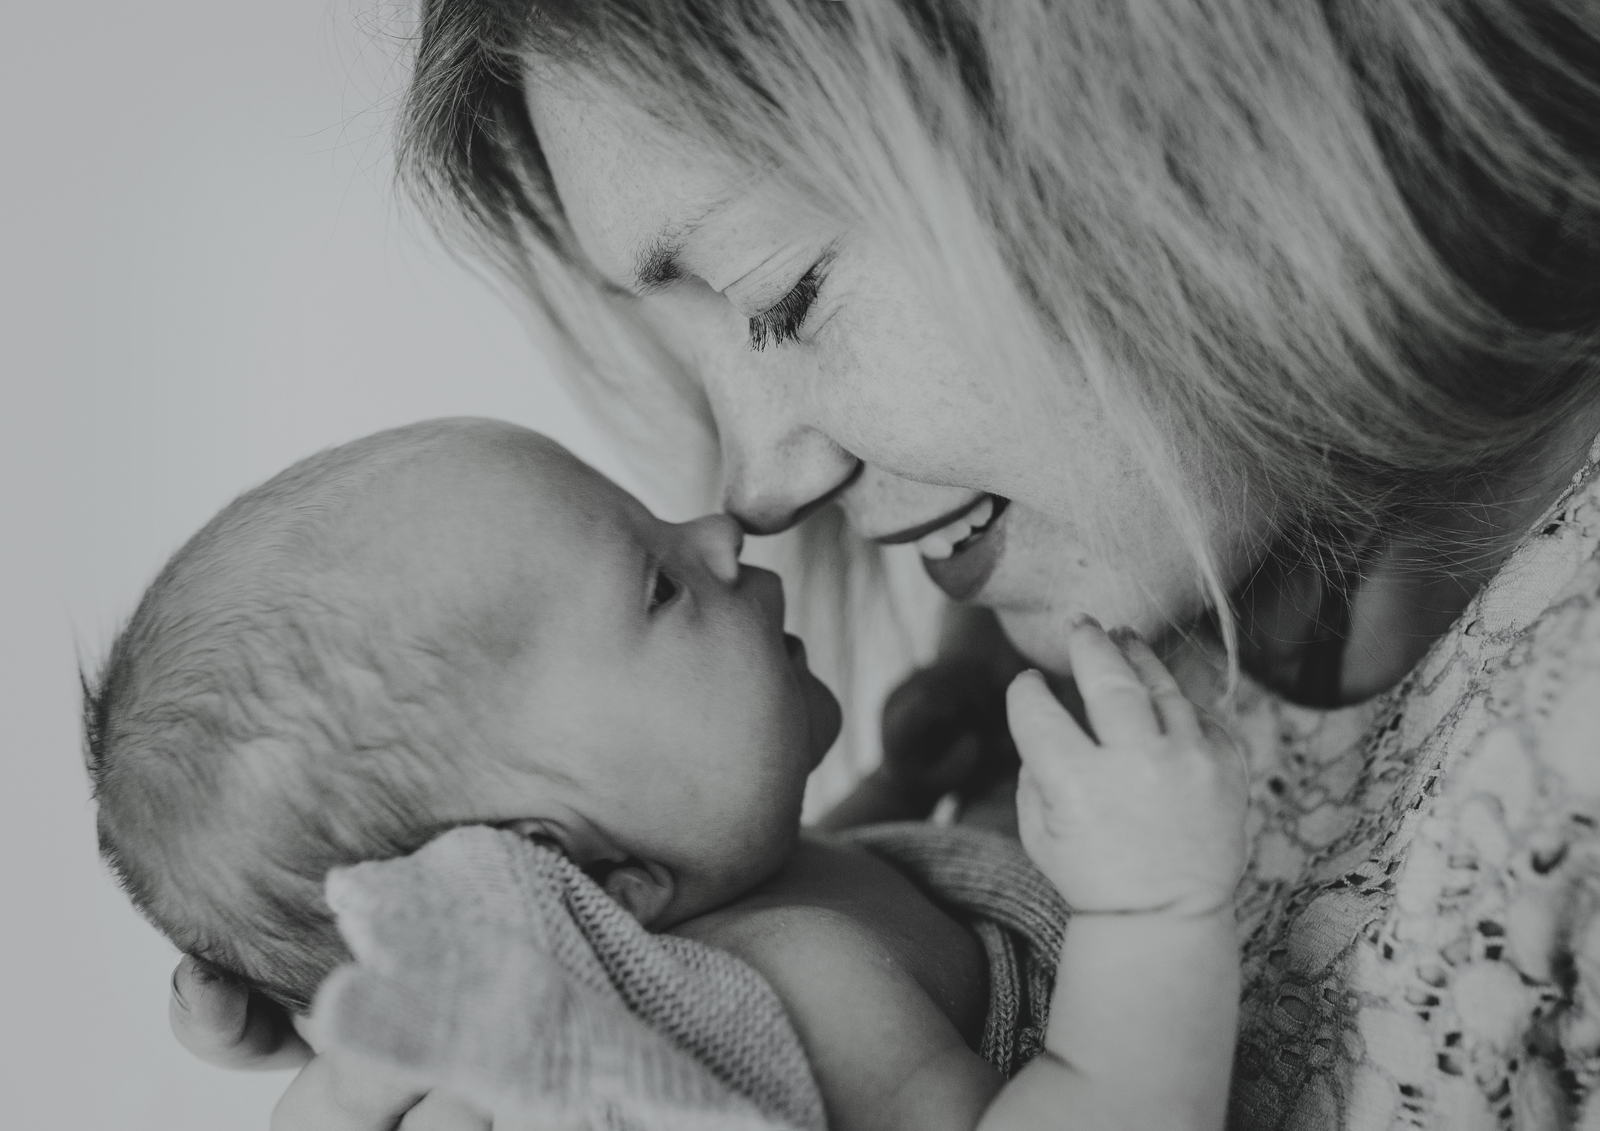 The scent of a newborn